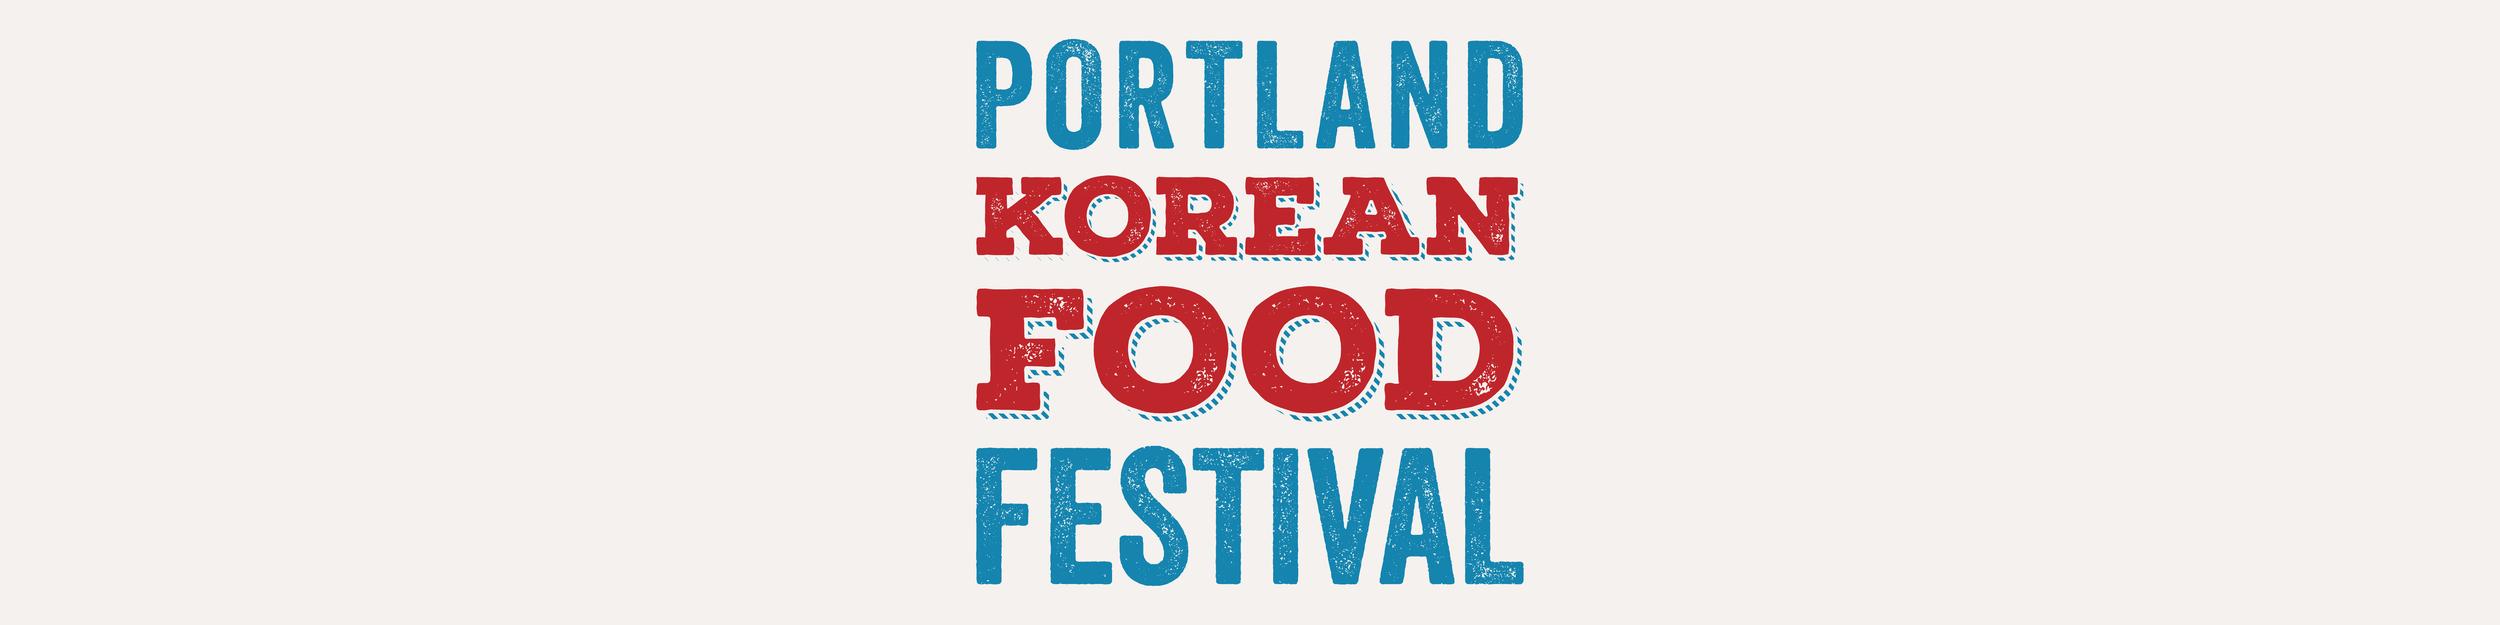 Portland Korean Food Fest